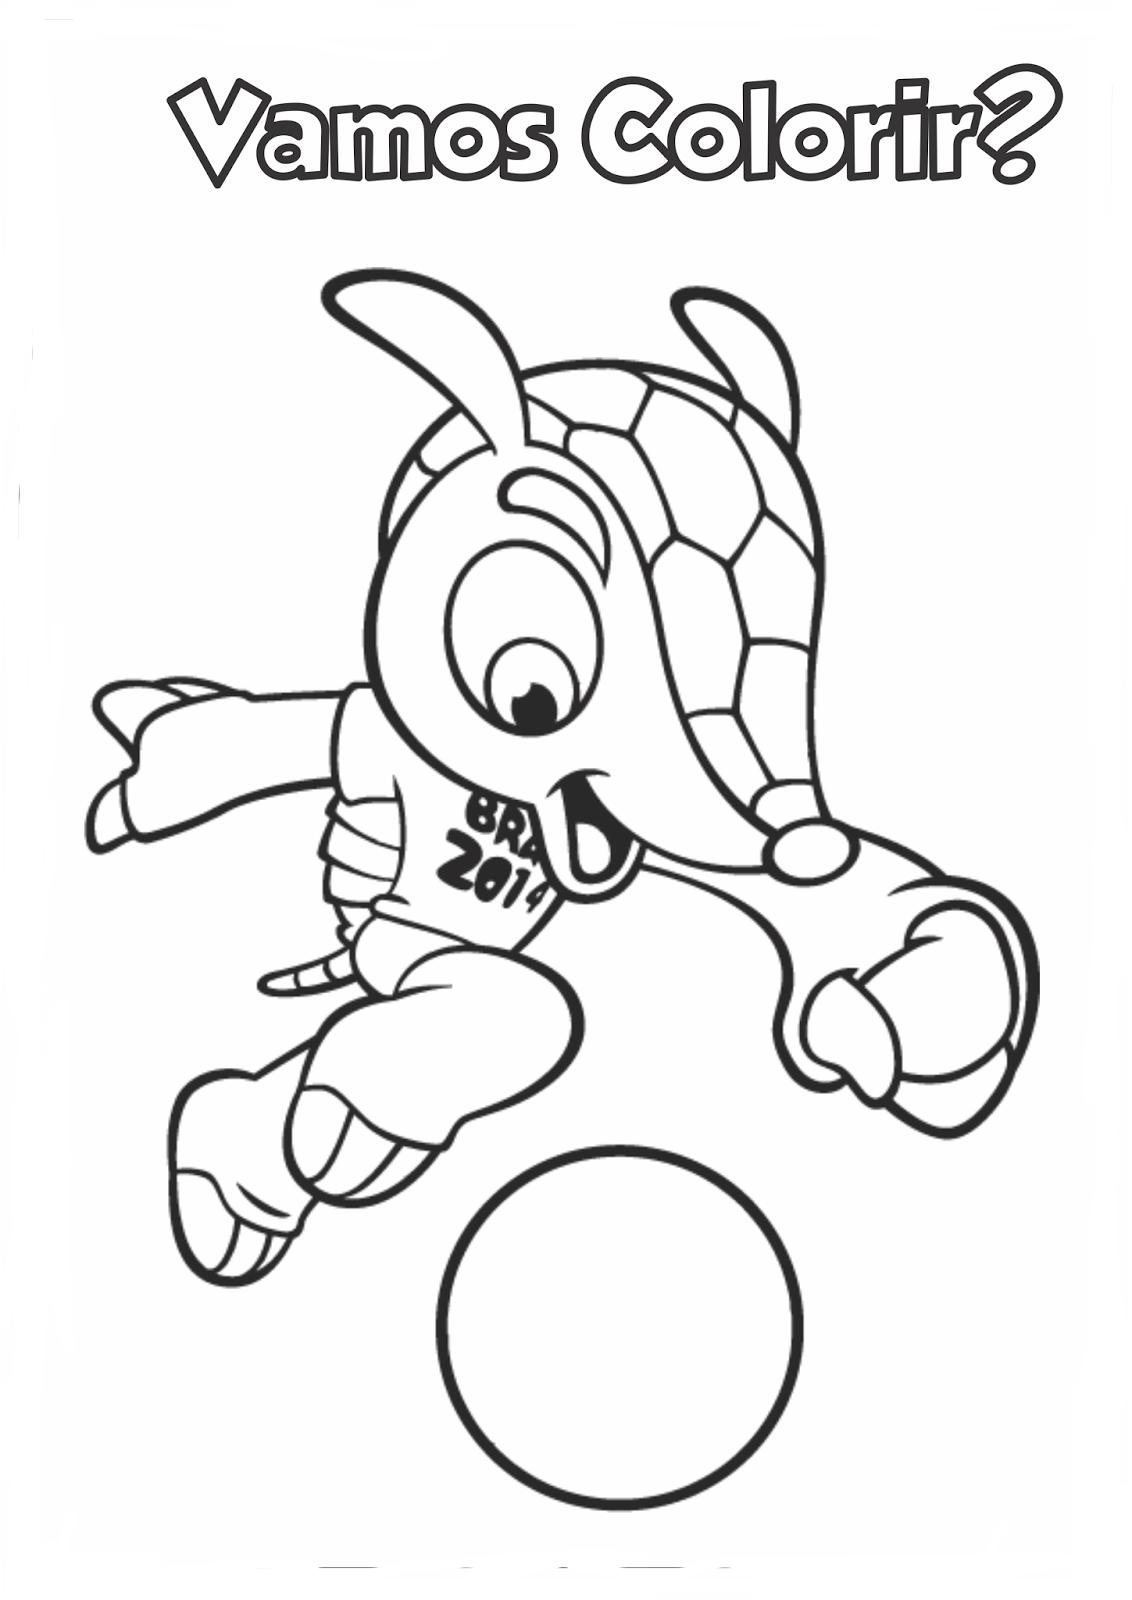 Desenho Da Copa Para Colorir 820ccce21a0